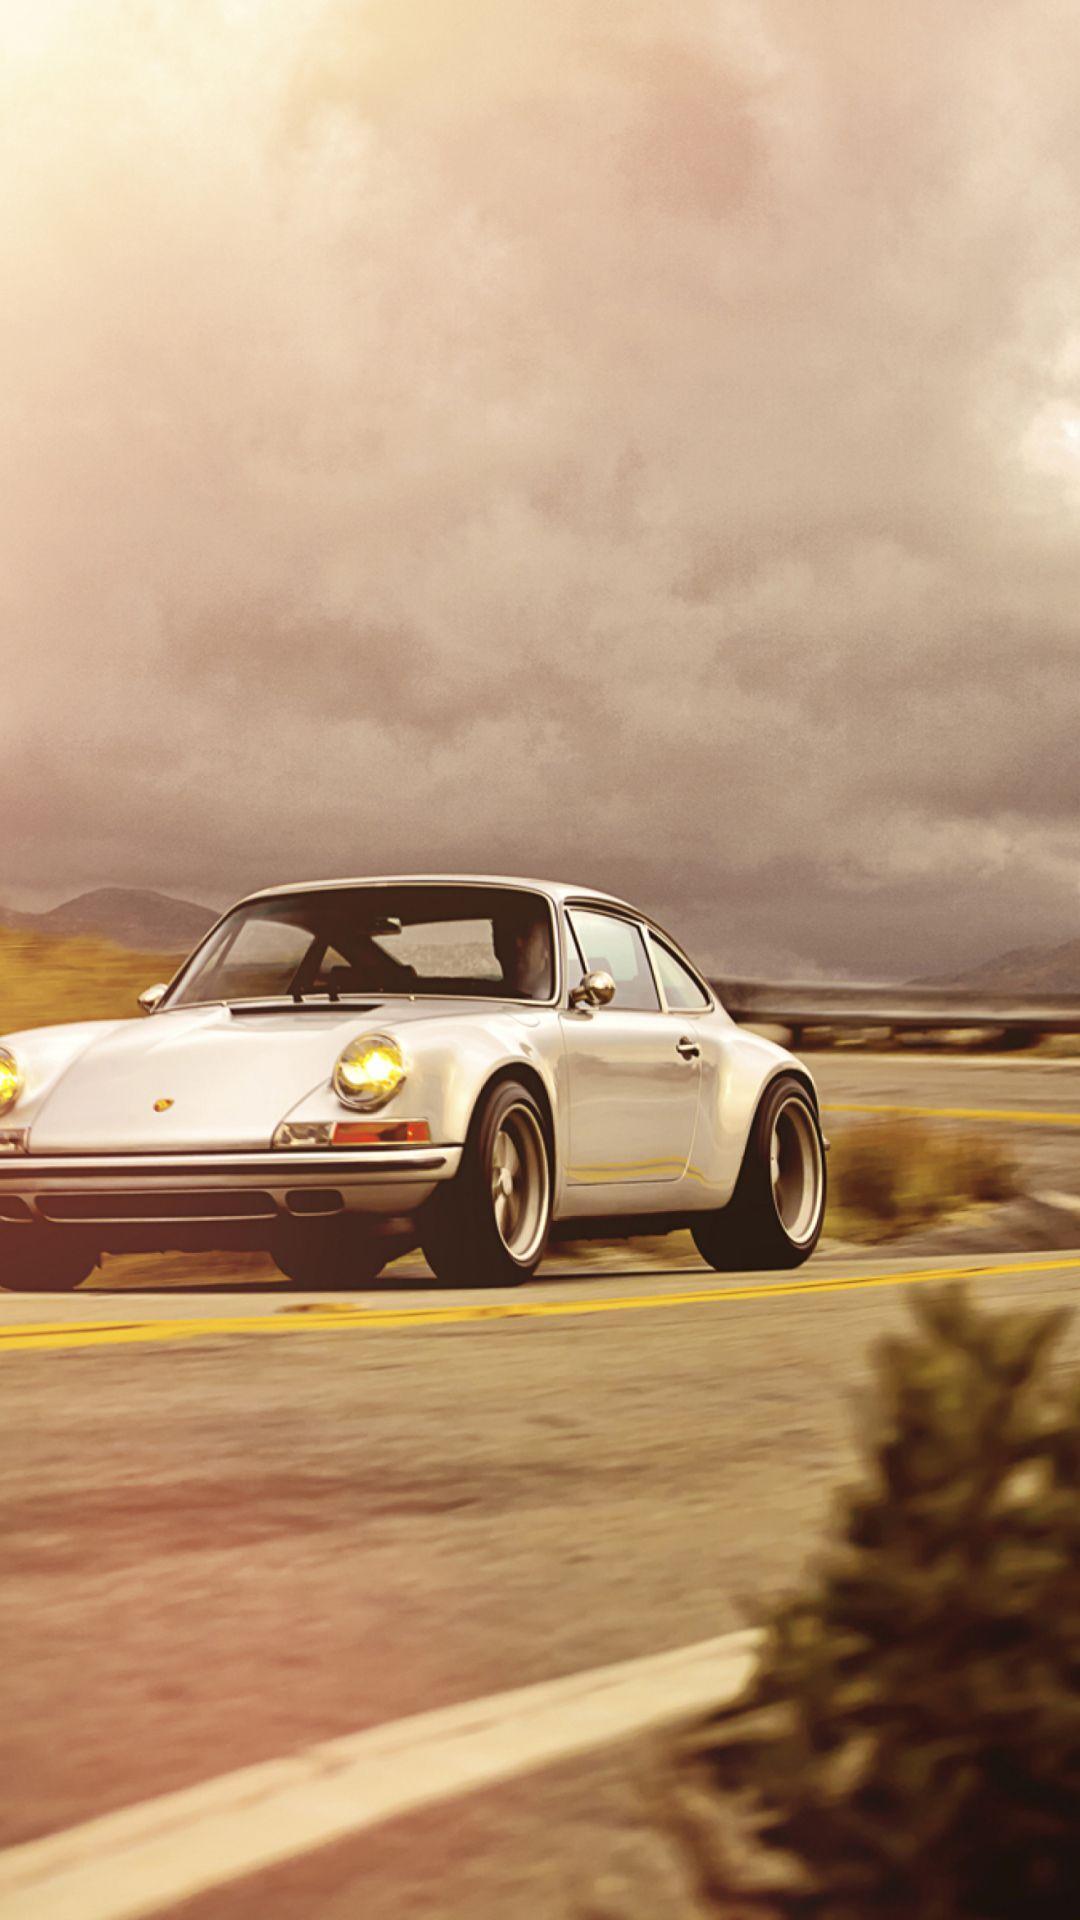 Porsche 911 Wallpapers Top Free Porsche 911 Backgrounds